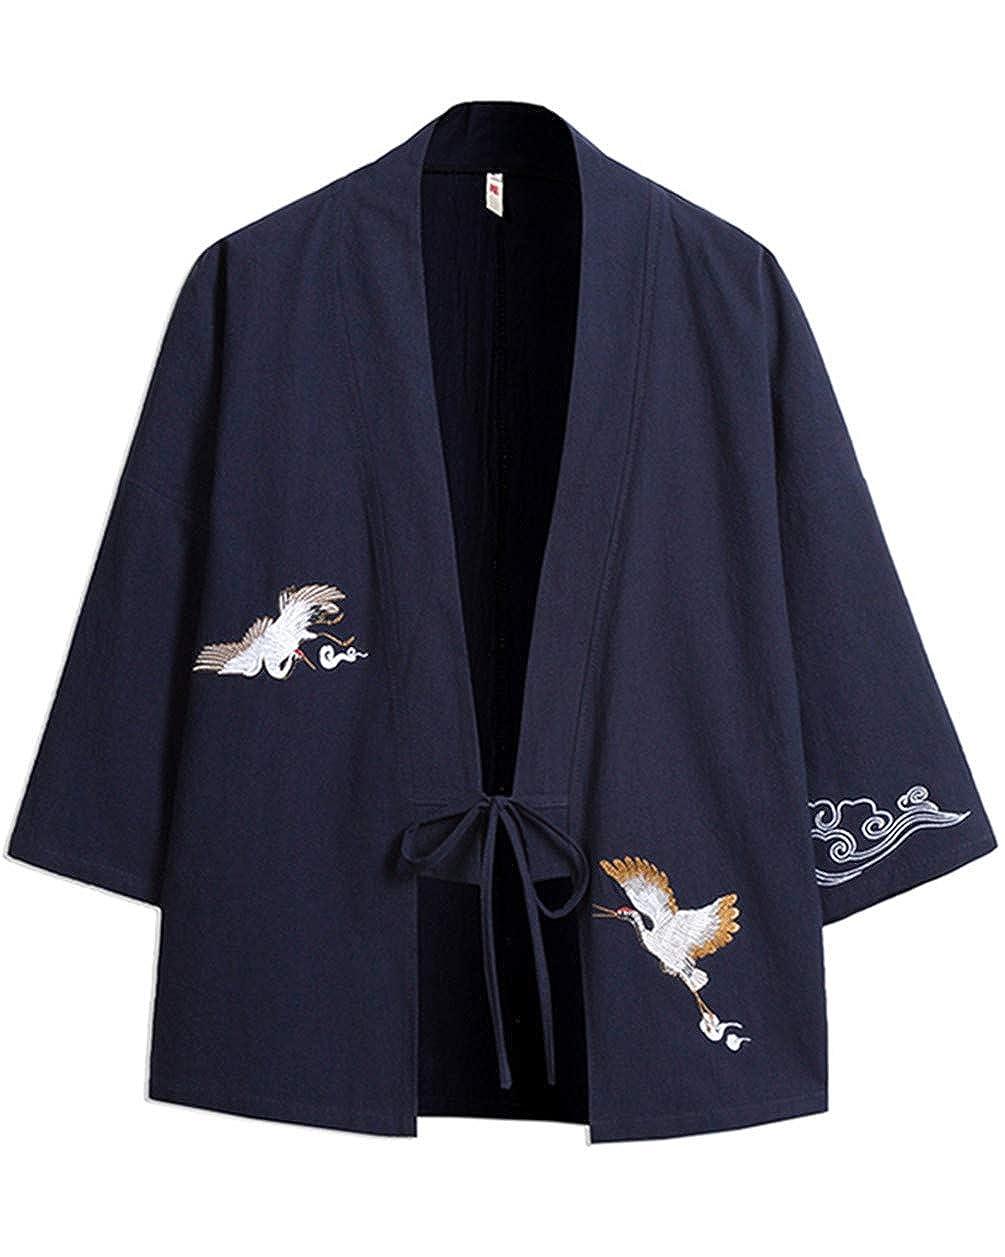 GUOCU Hombre Bordado Cloak Cárdigan Camisa Chaqueta de Kimono Japonesa Casual